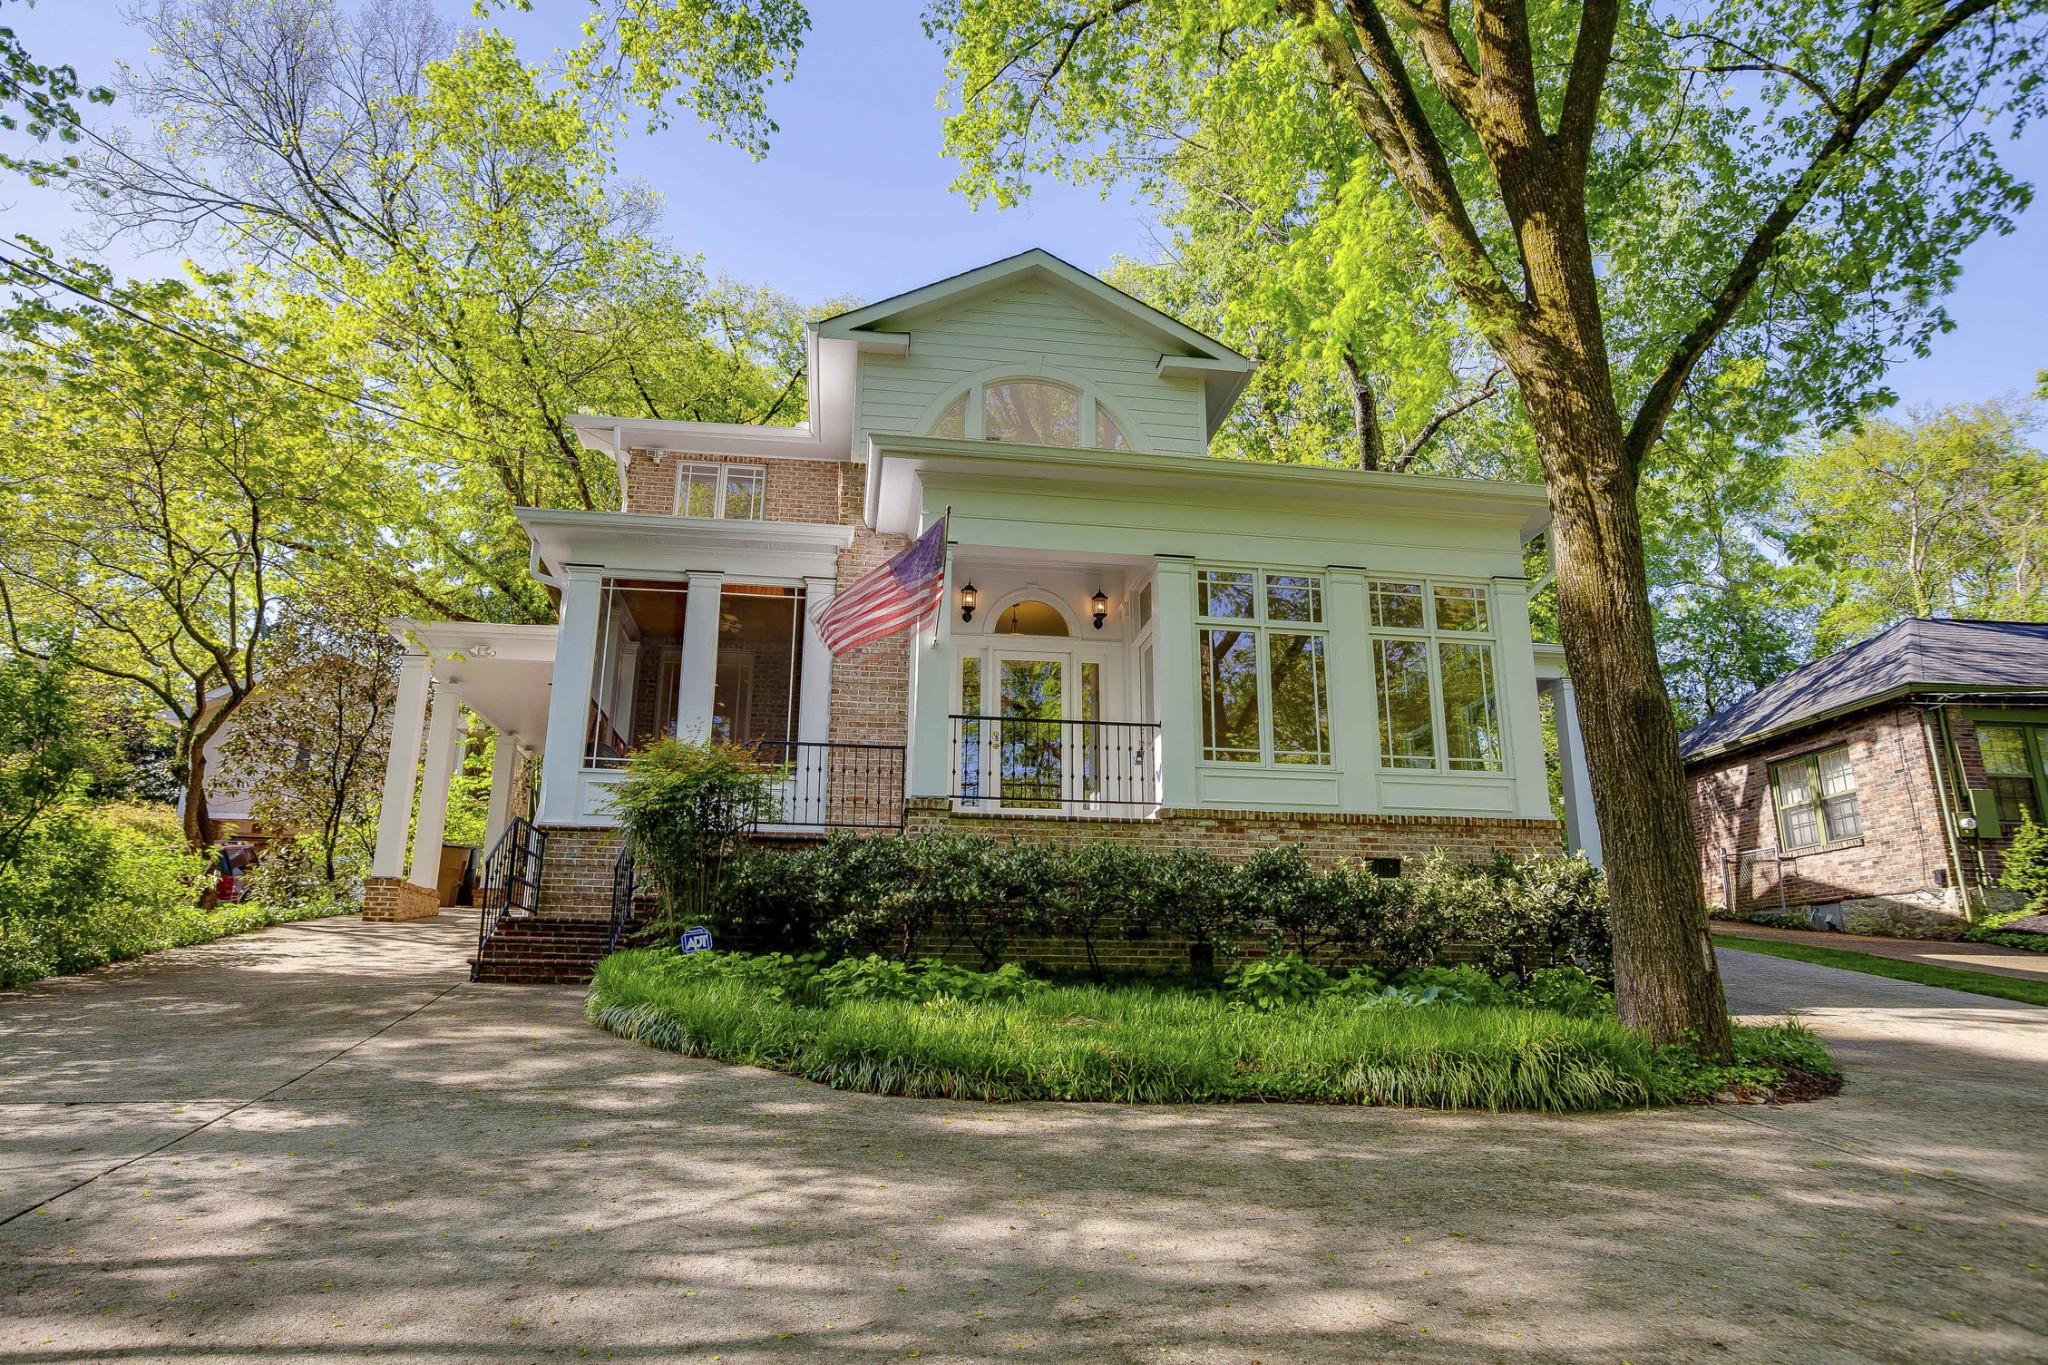 3809 Rolland Rd Property Photo - Nashville, TN real estate listing